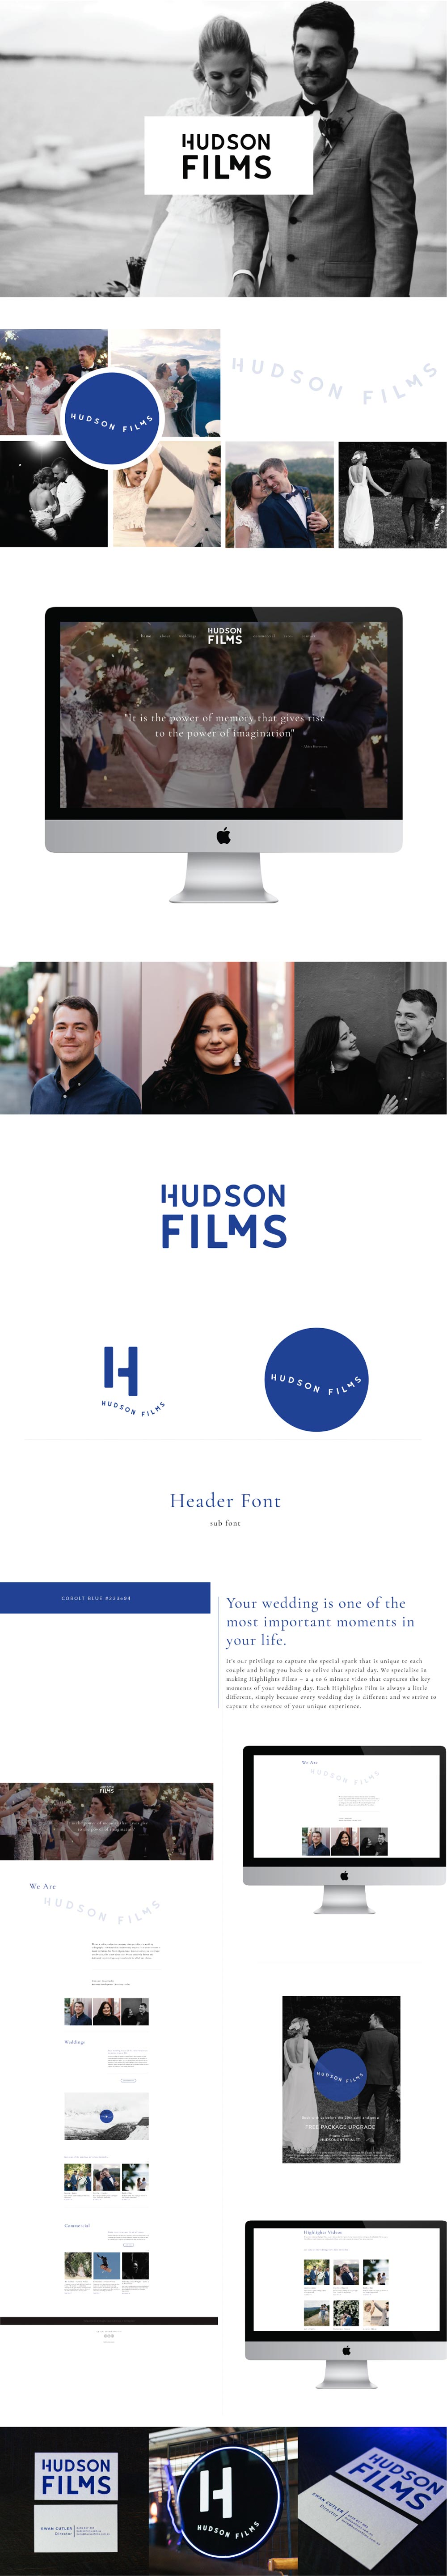 IMO-CREATIVE-HUDSON-FILMS-BRANDING---SQUARESPACE-WEBSITE.jpg